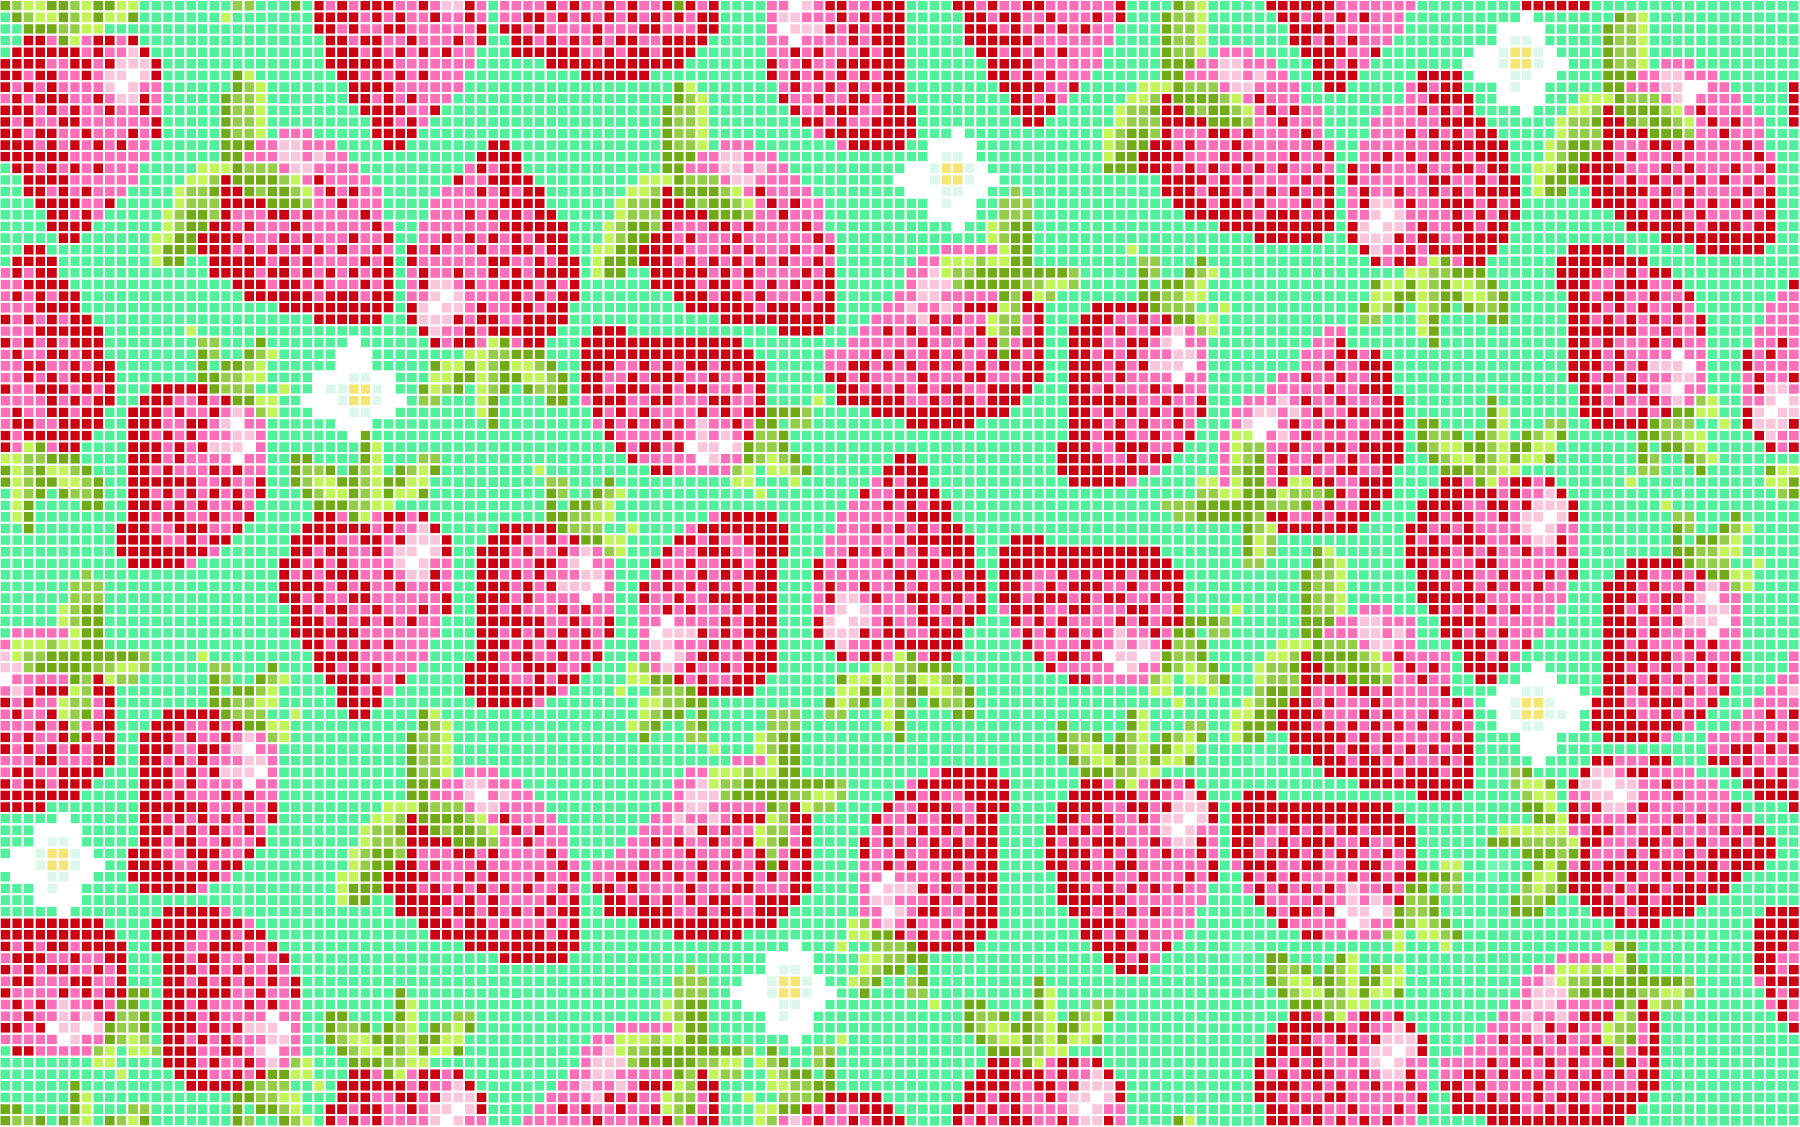 strawberries turquoise 6 inch-01.jpg